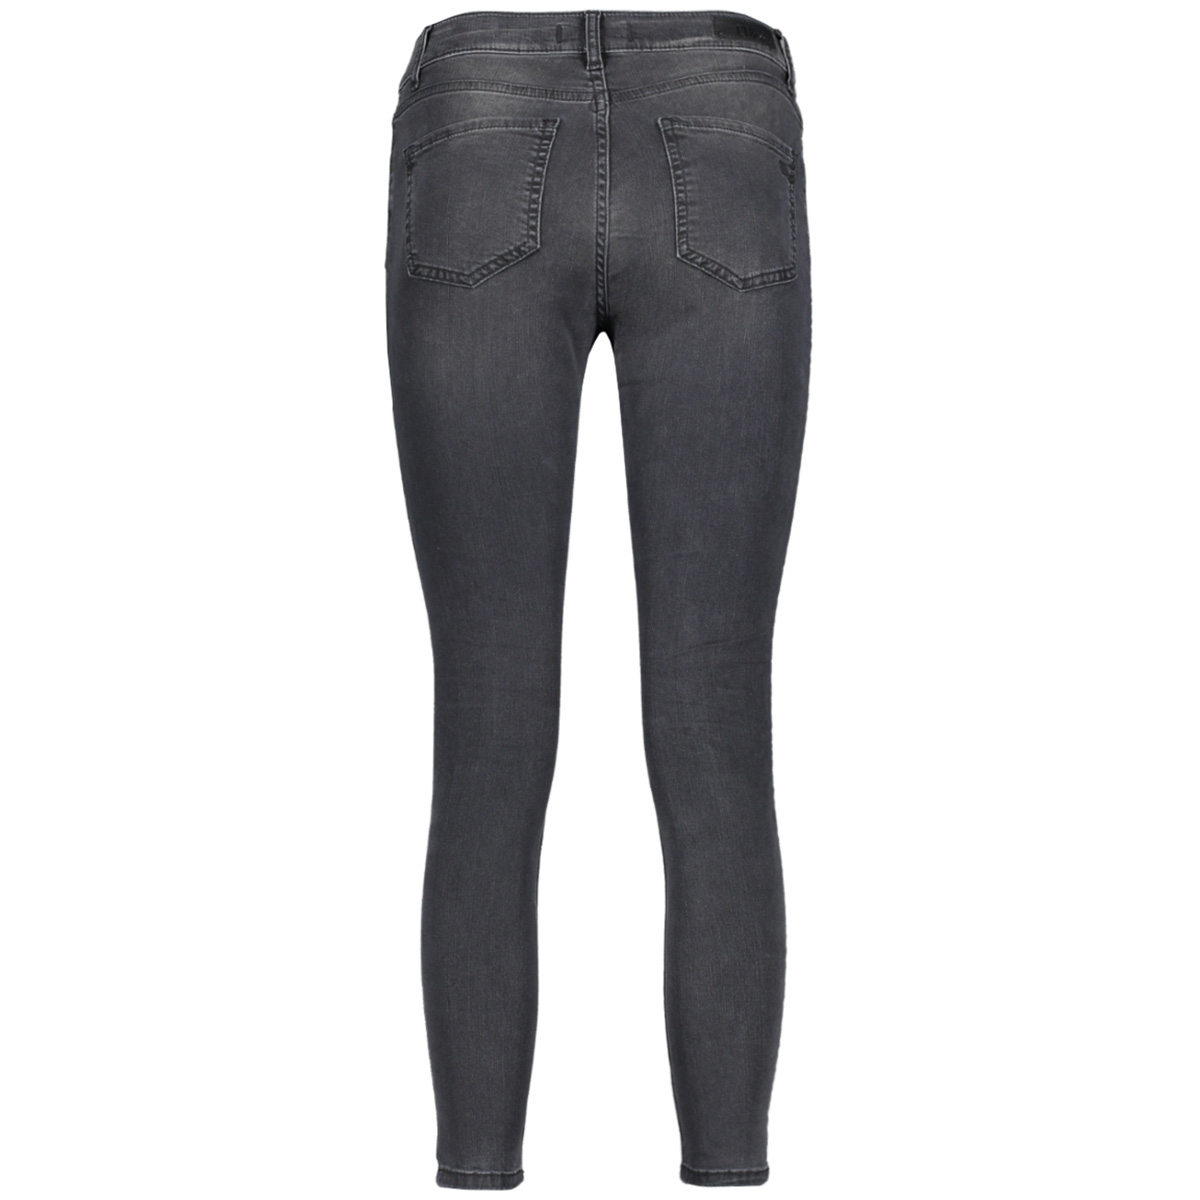 lonia 51032 ltb jeans 14647 feal undamaged wash